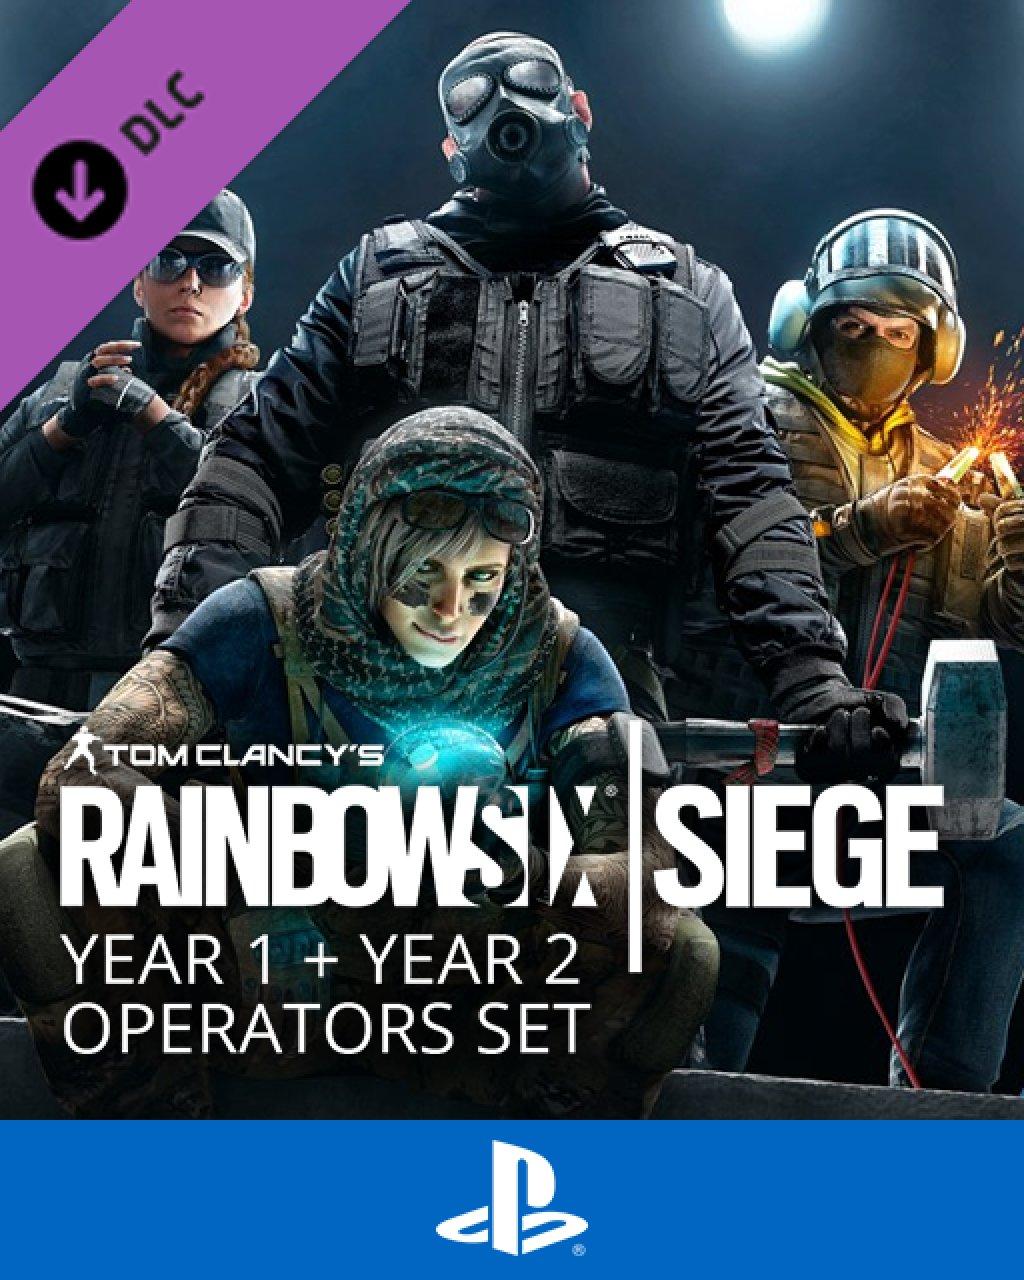 Tom Clancy's Rainbow Six Siege Year 1 + Year 2 Operators Set